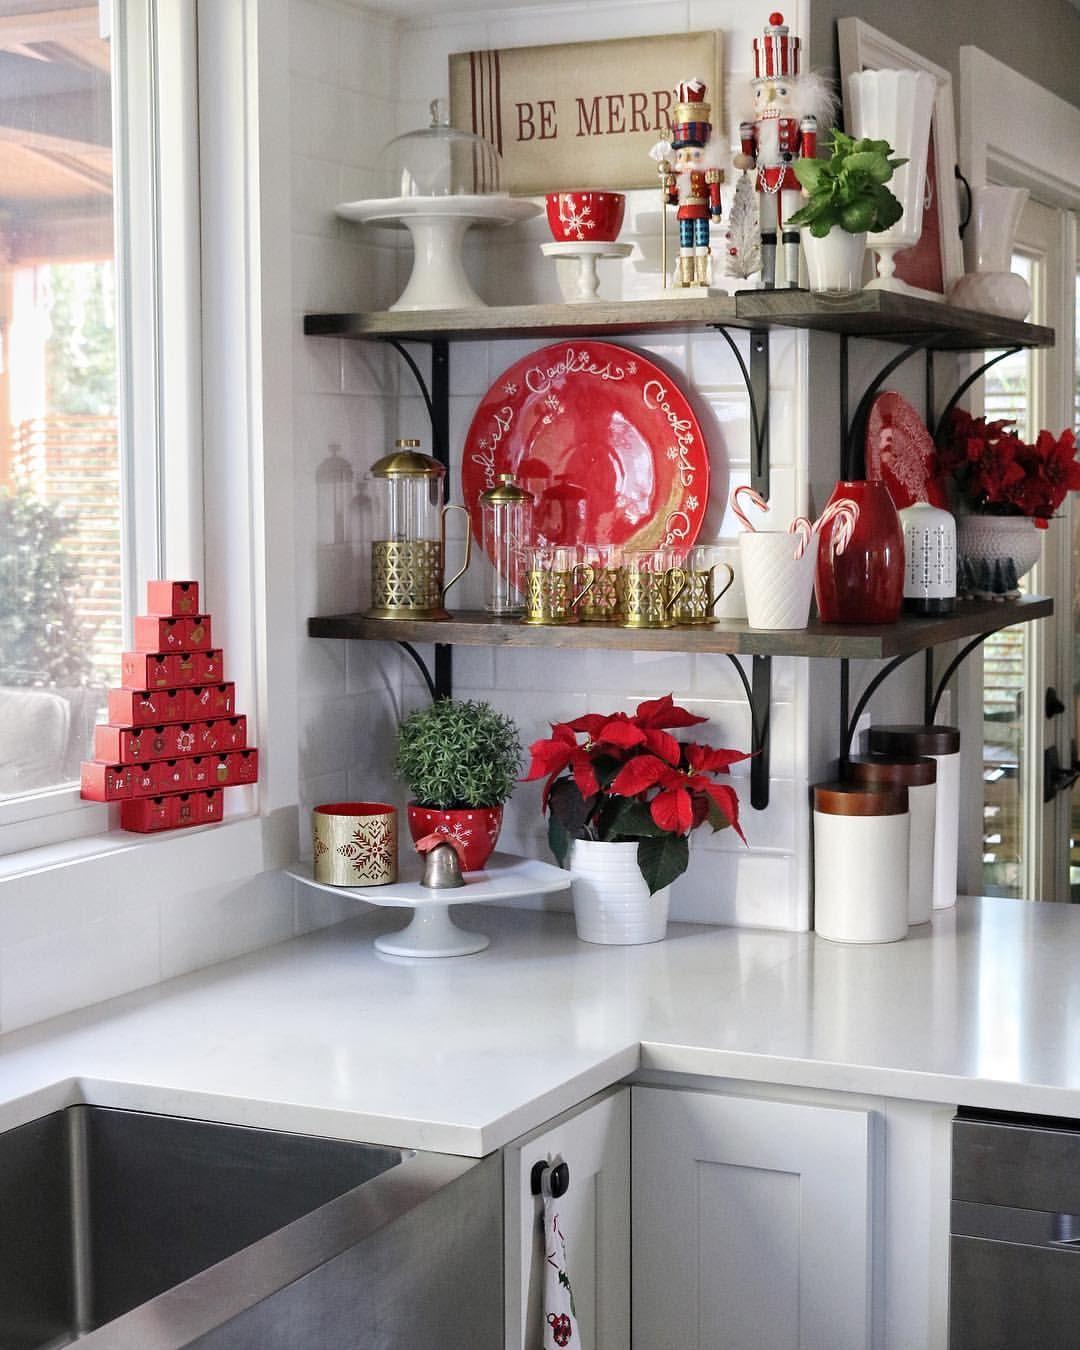 red white christmas kitchen whitekitchen christmaskitchen christmasdecor christmas on kitchen xmas decor id=47792